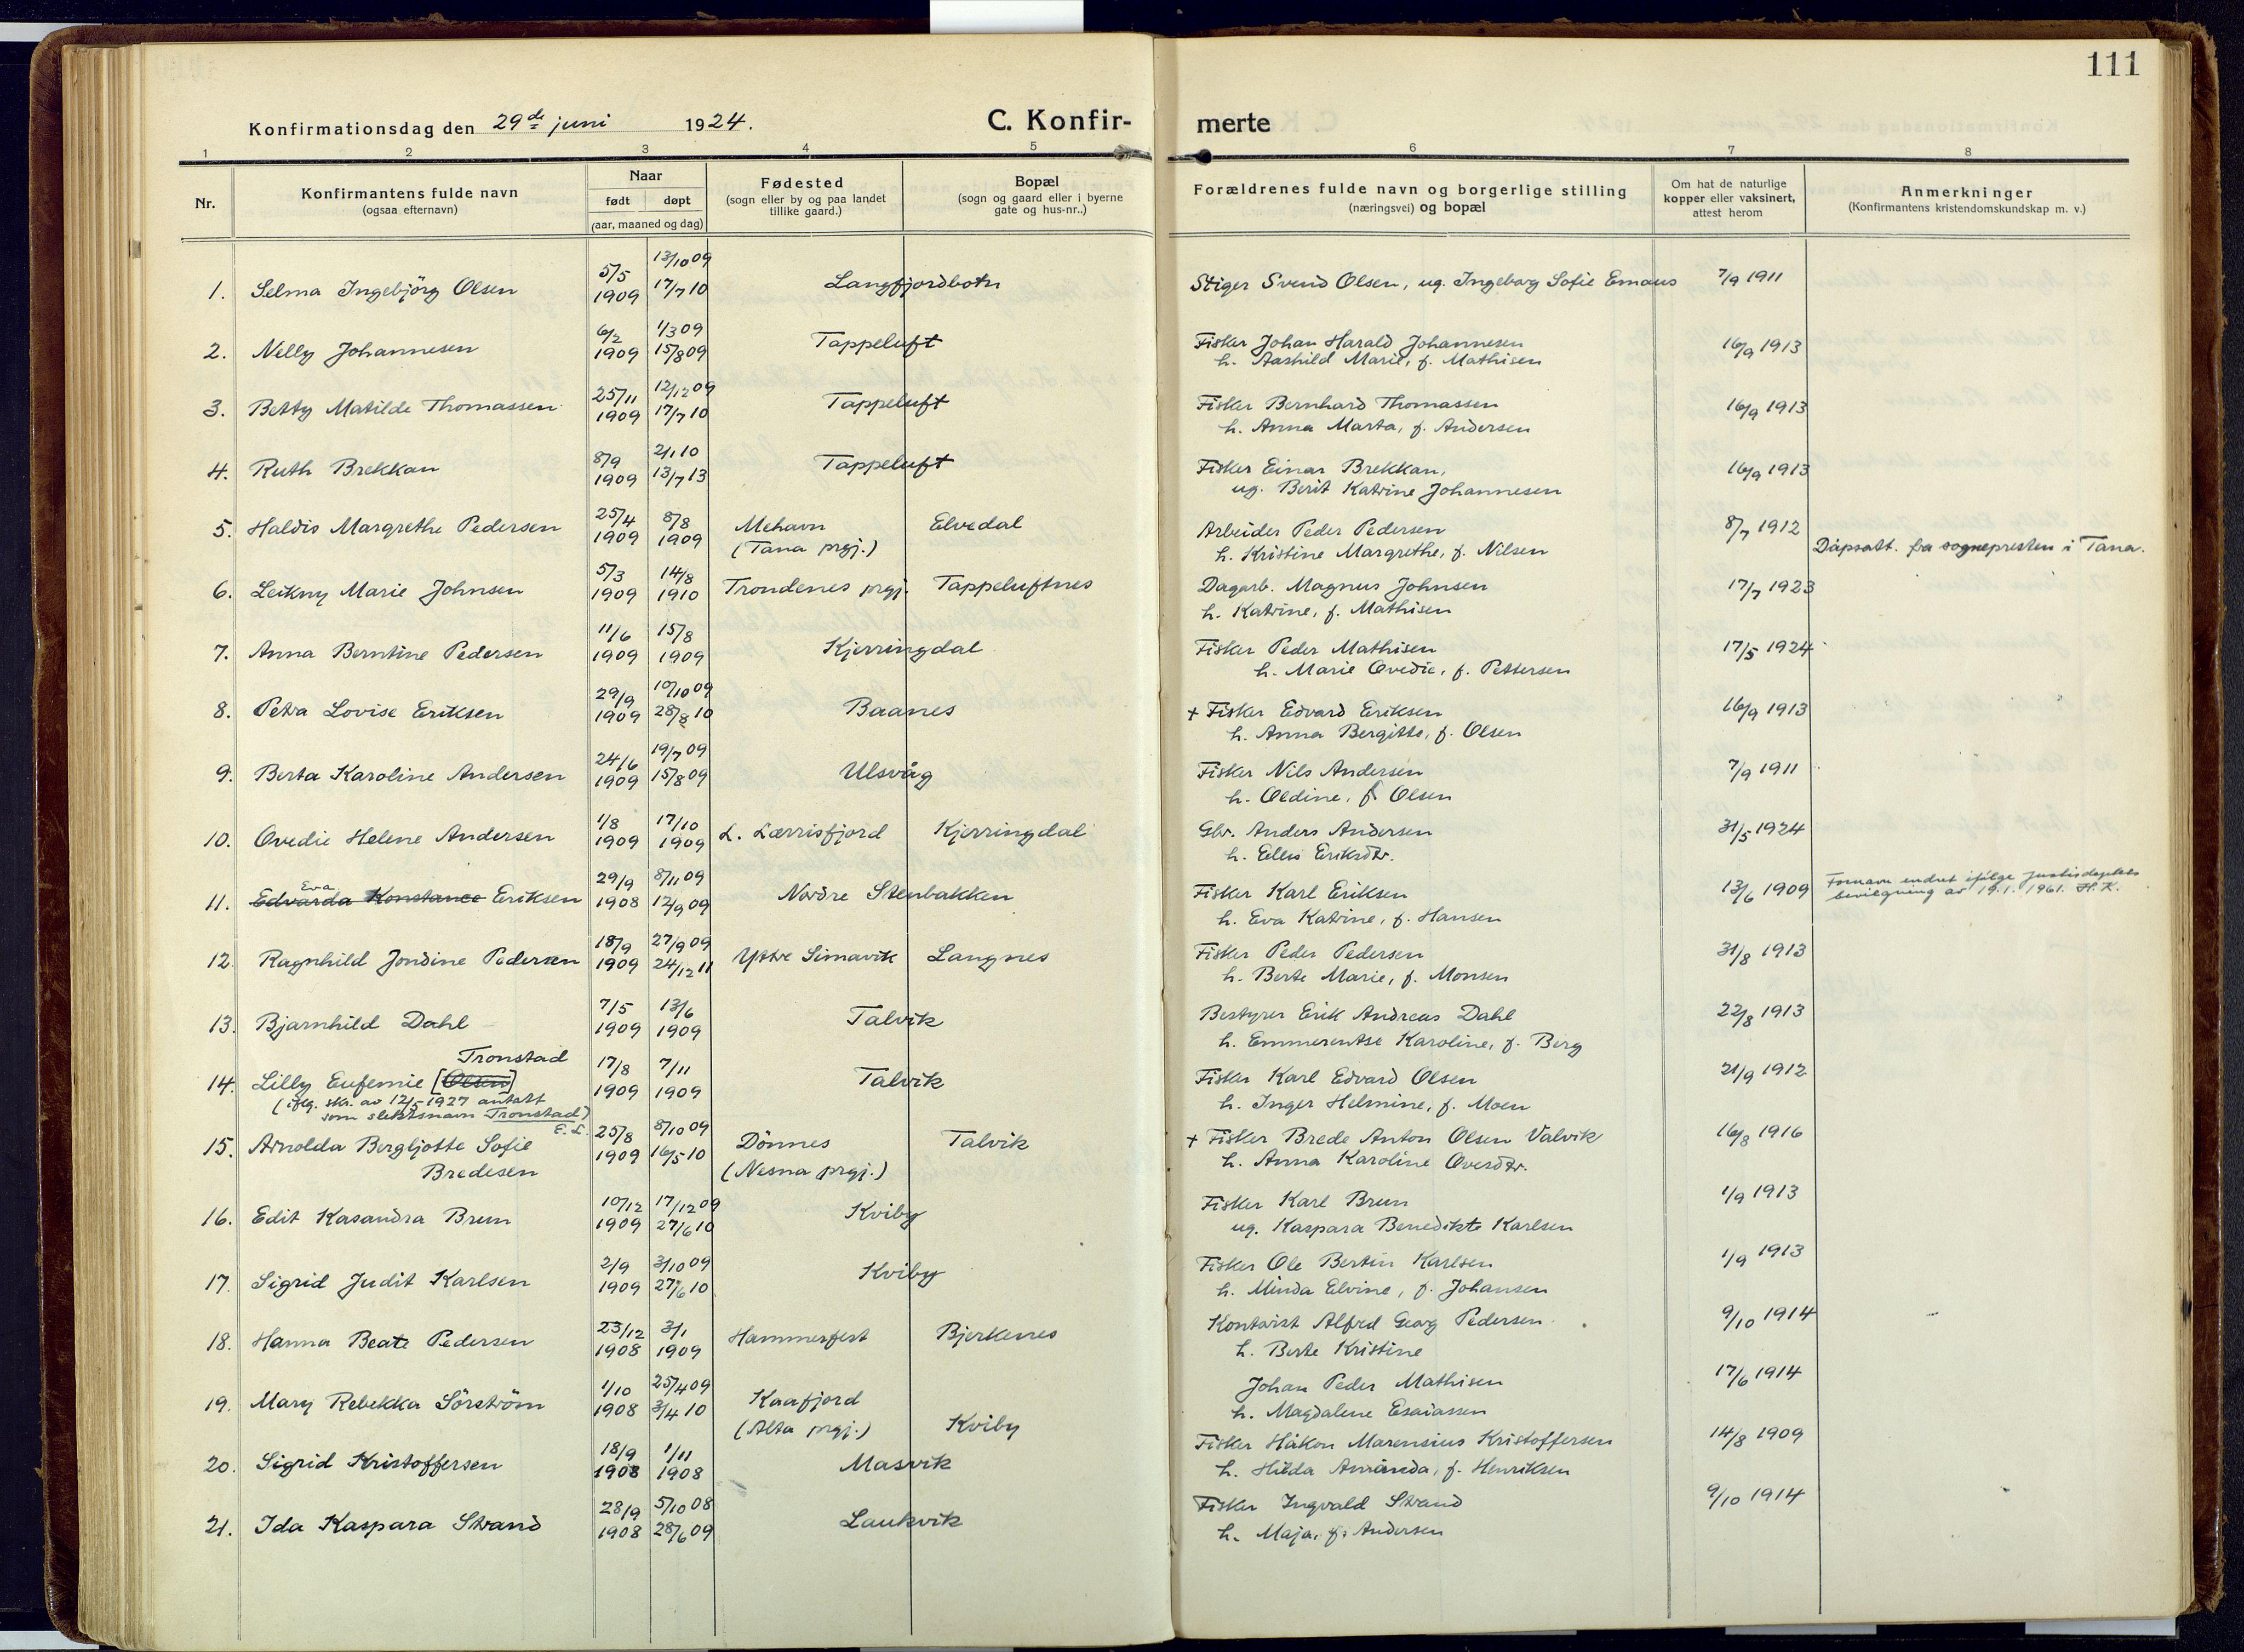 SATØ, Talvik sokneprestkontor, H/Ha/L0018kirke: Ministerialbok nr. 18, 1915-1924, s. 111